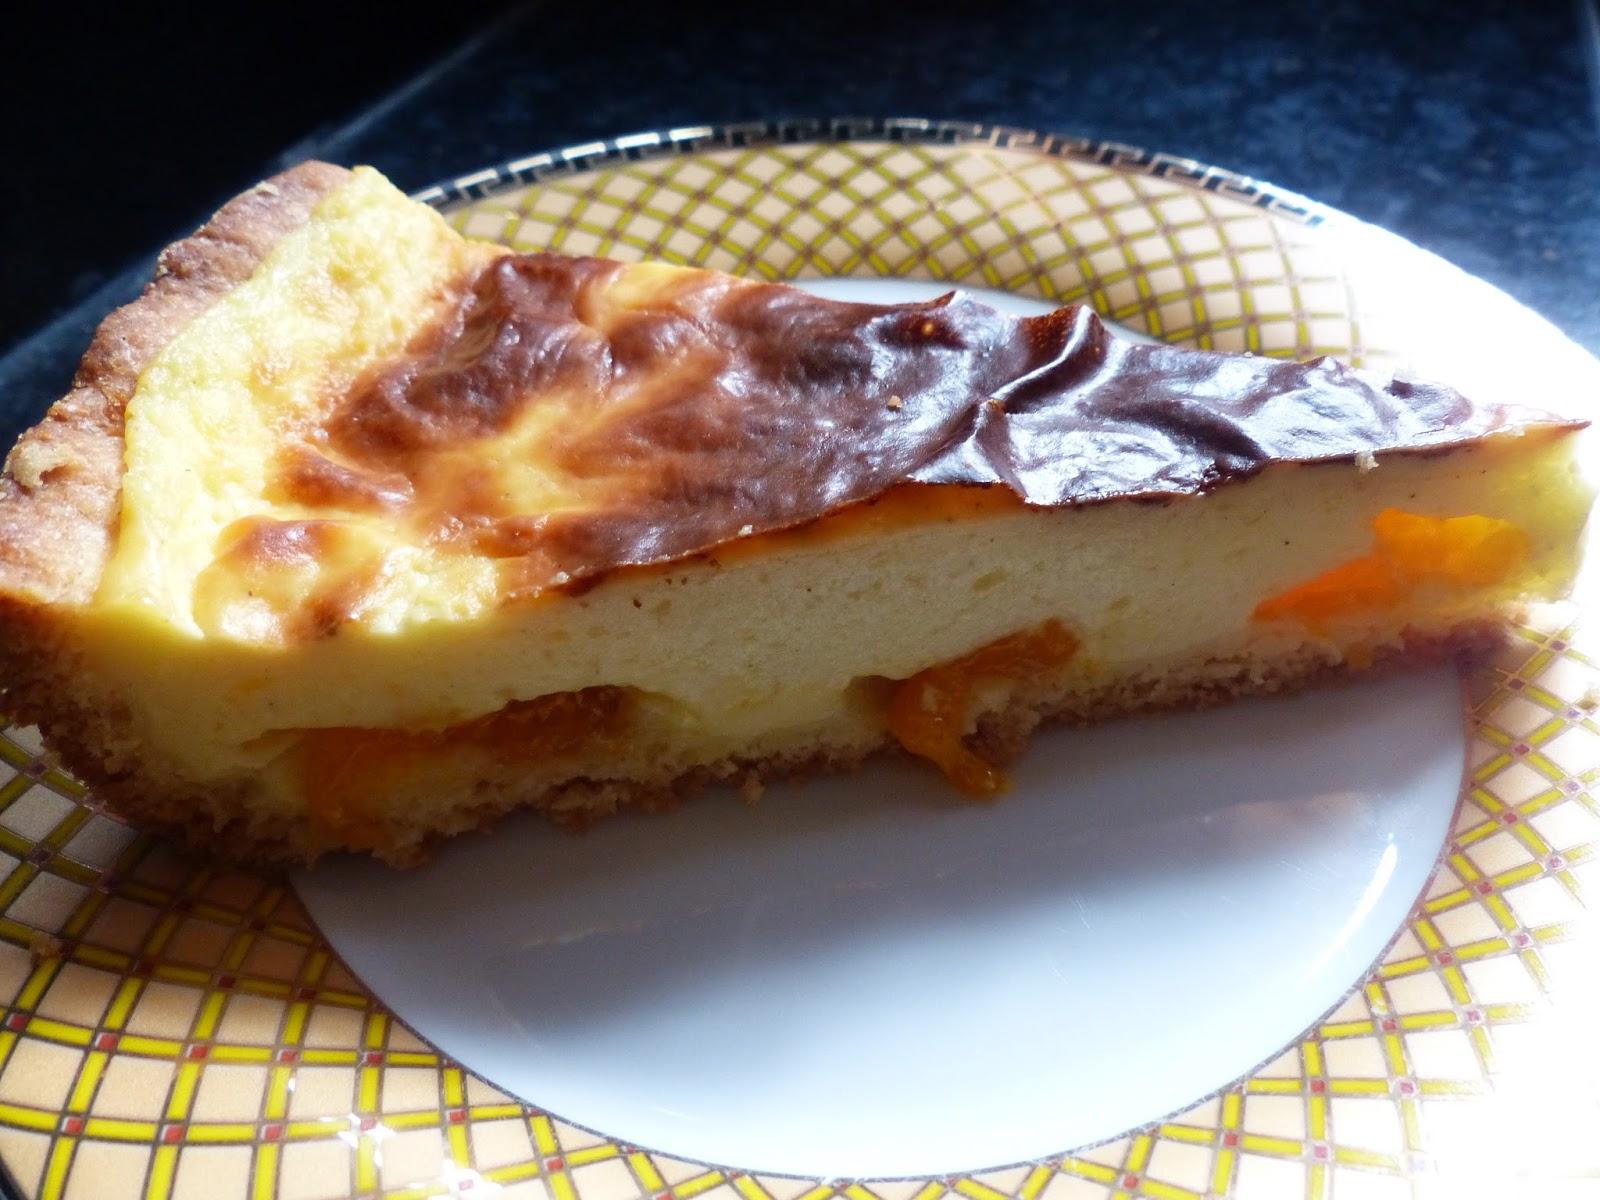 Verboten Gut Pudding Schmand Kuchen Mit Mandarinen